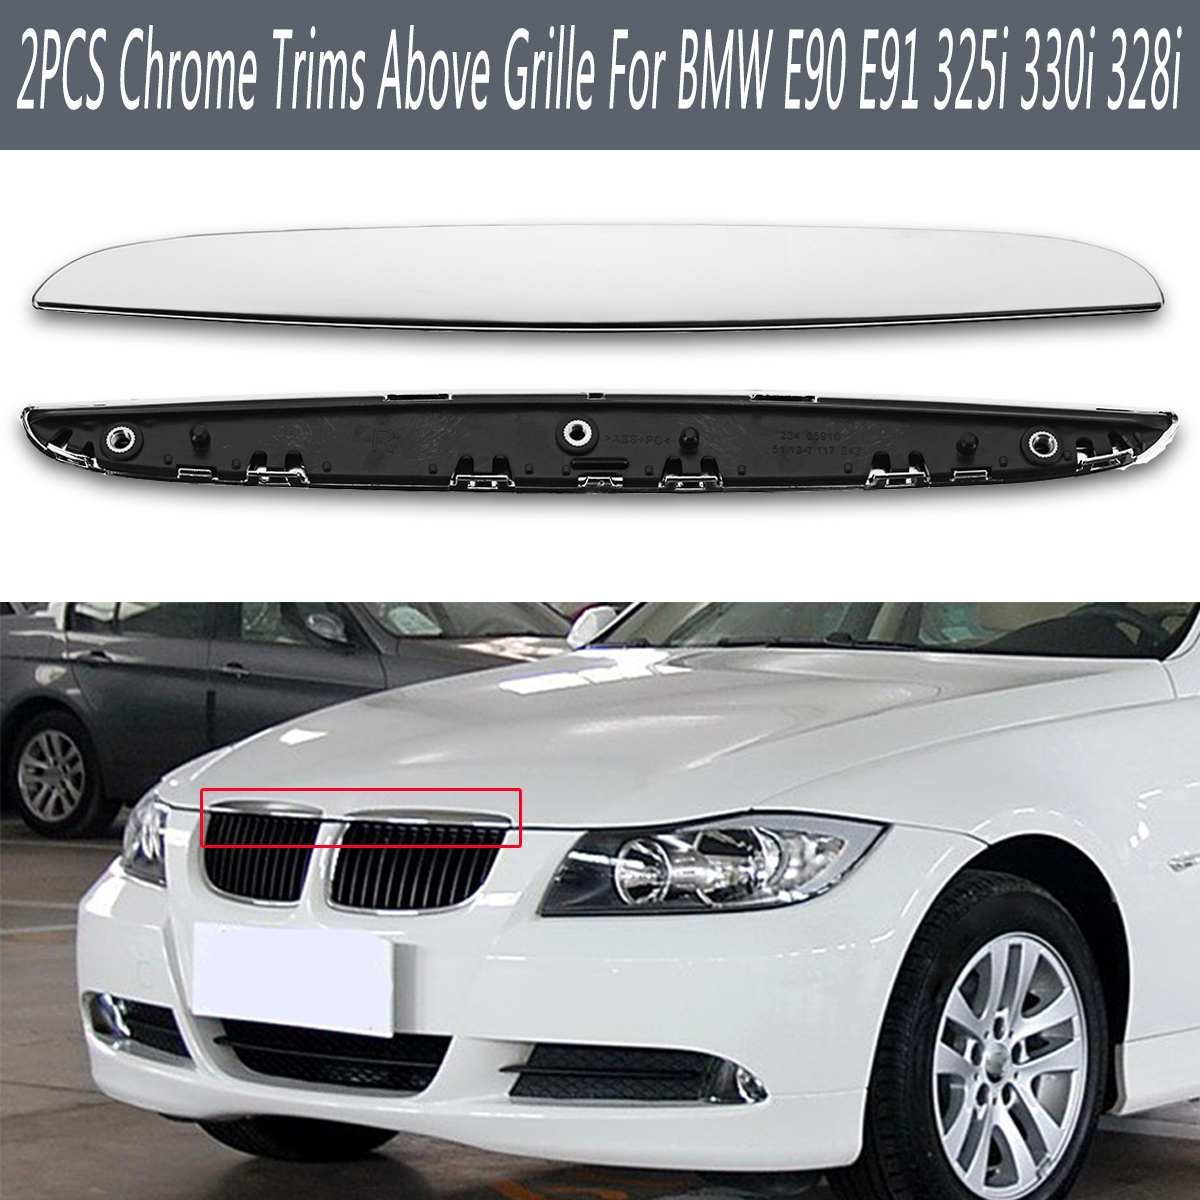 2pcs ABS Hood R & L Chrome Trims Above Kidney Grille for BMW E90 E91 325i 330i 328i Strips Molding Exterior Parts